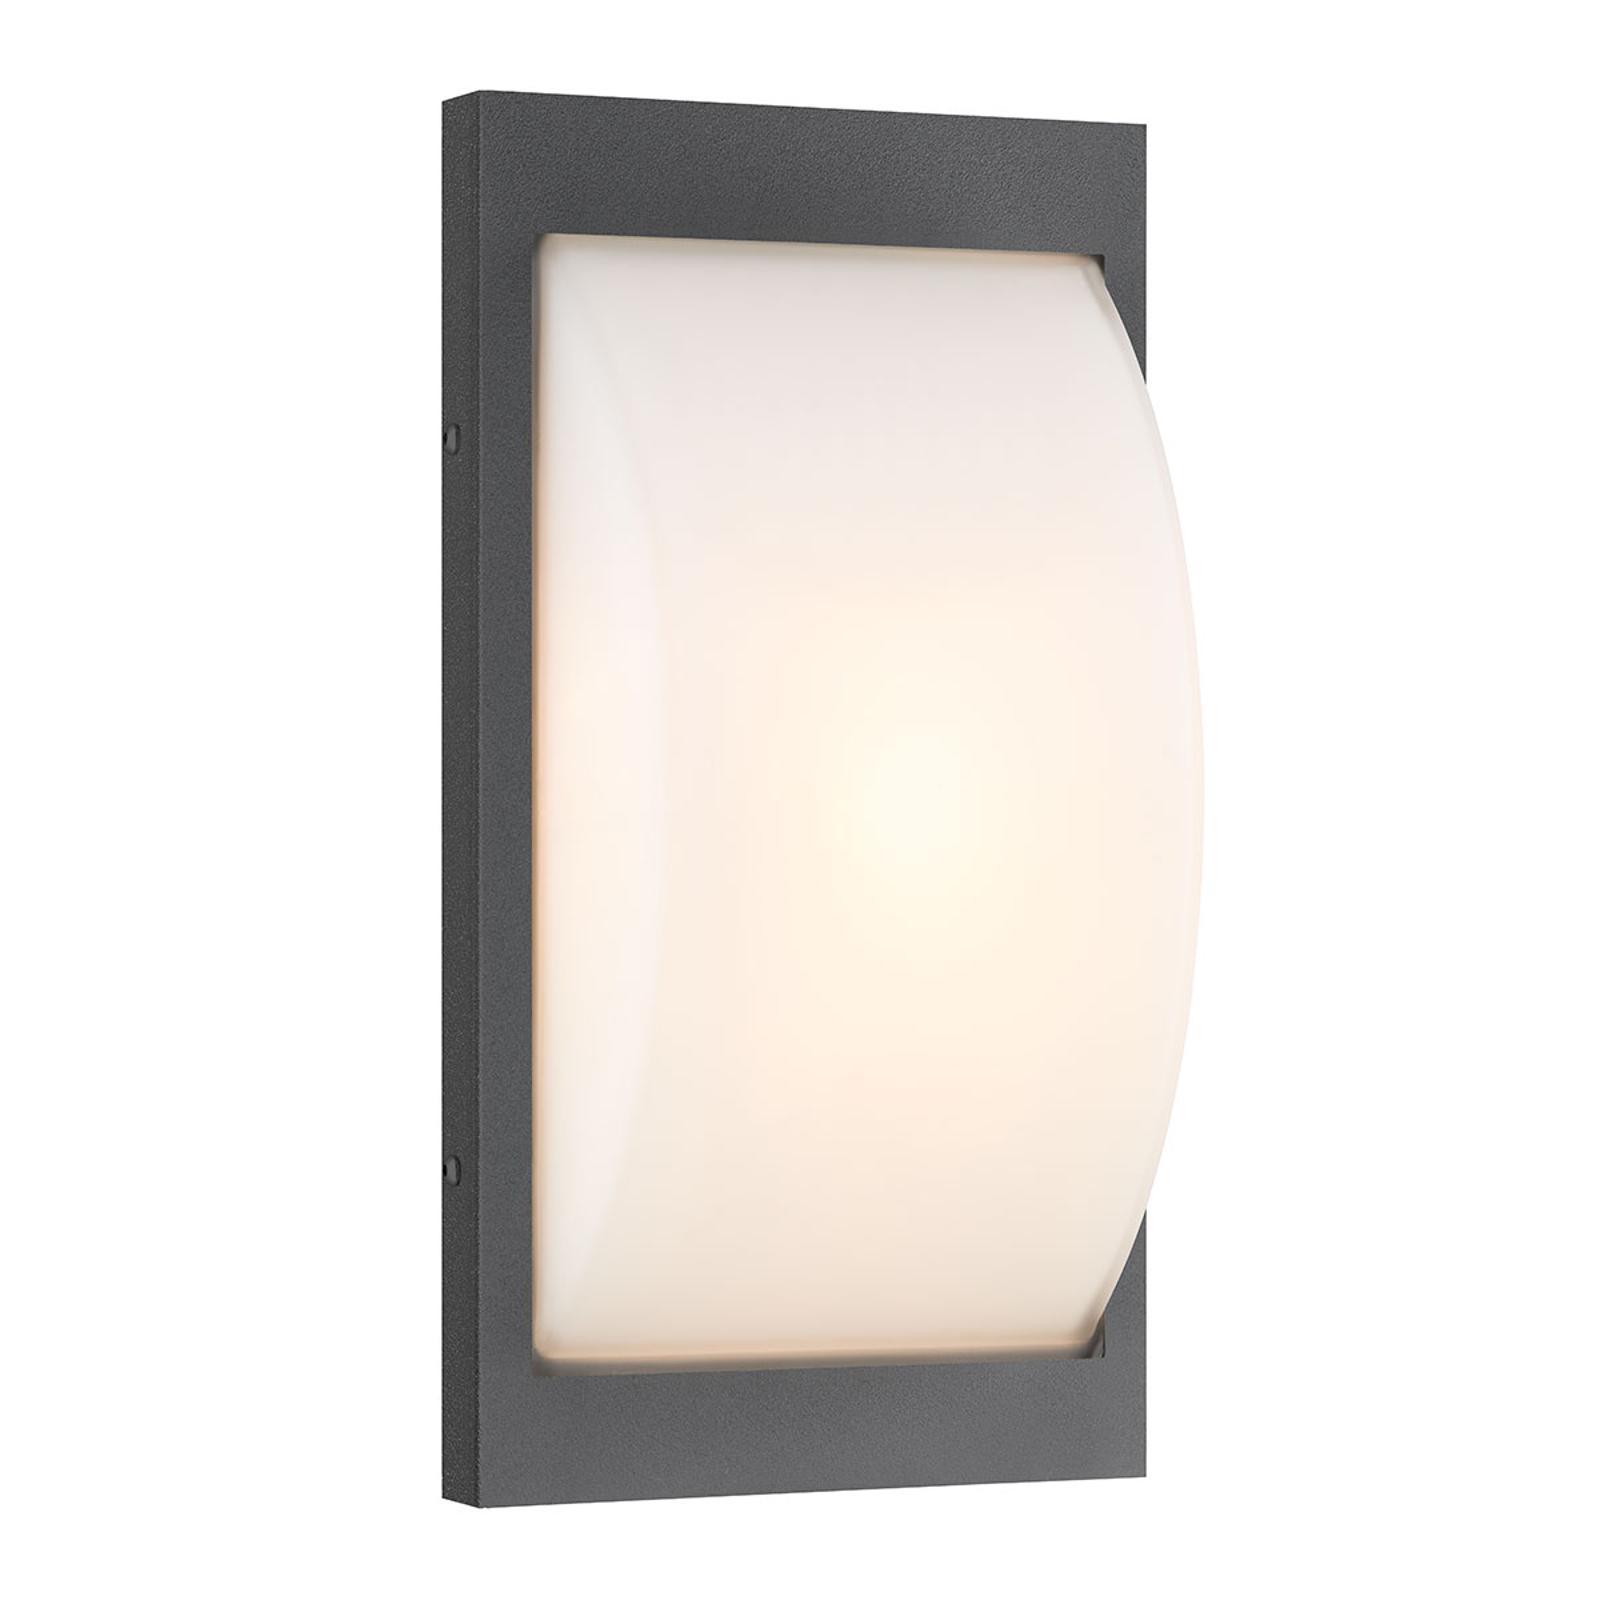 LED-Außenwandleuchte Typ 069LED graphit